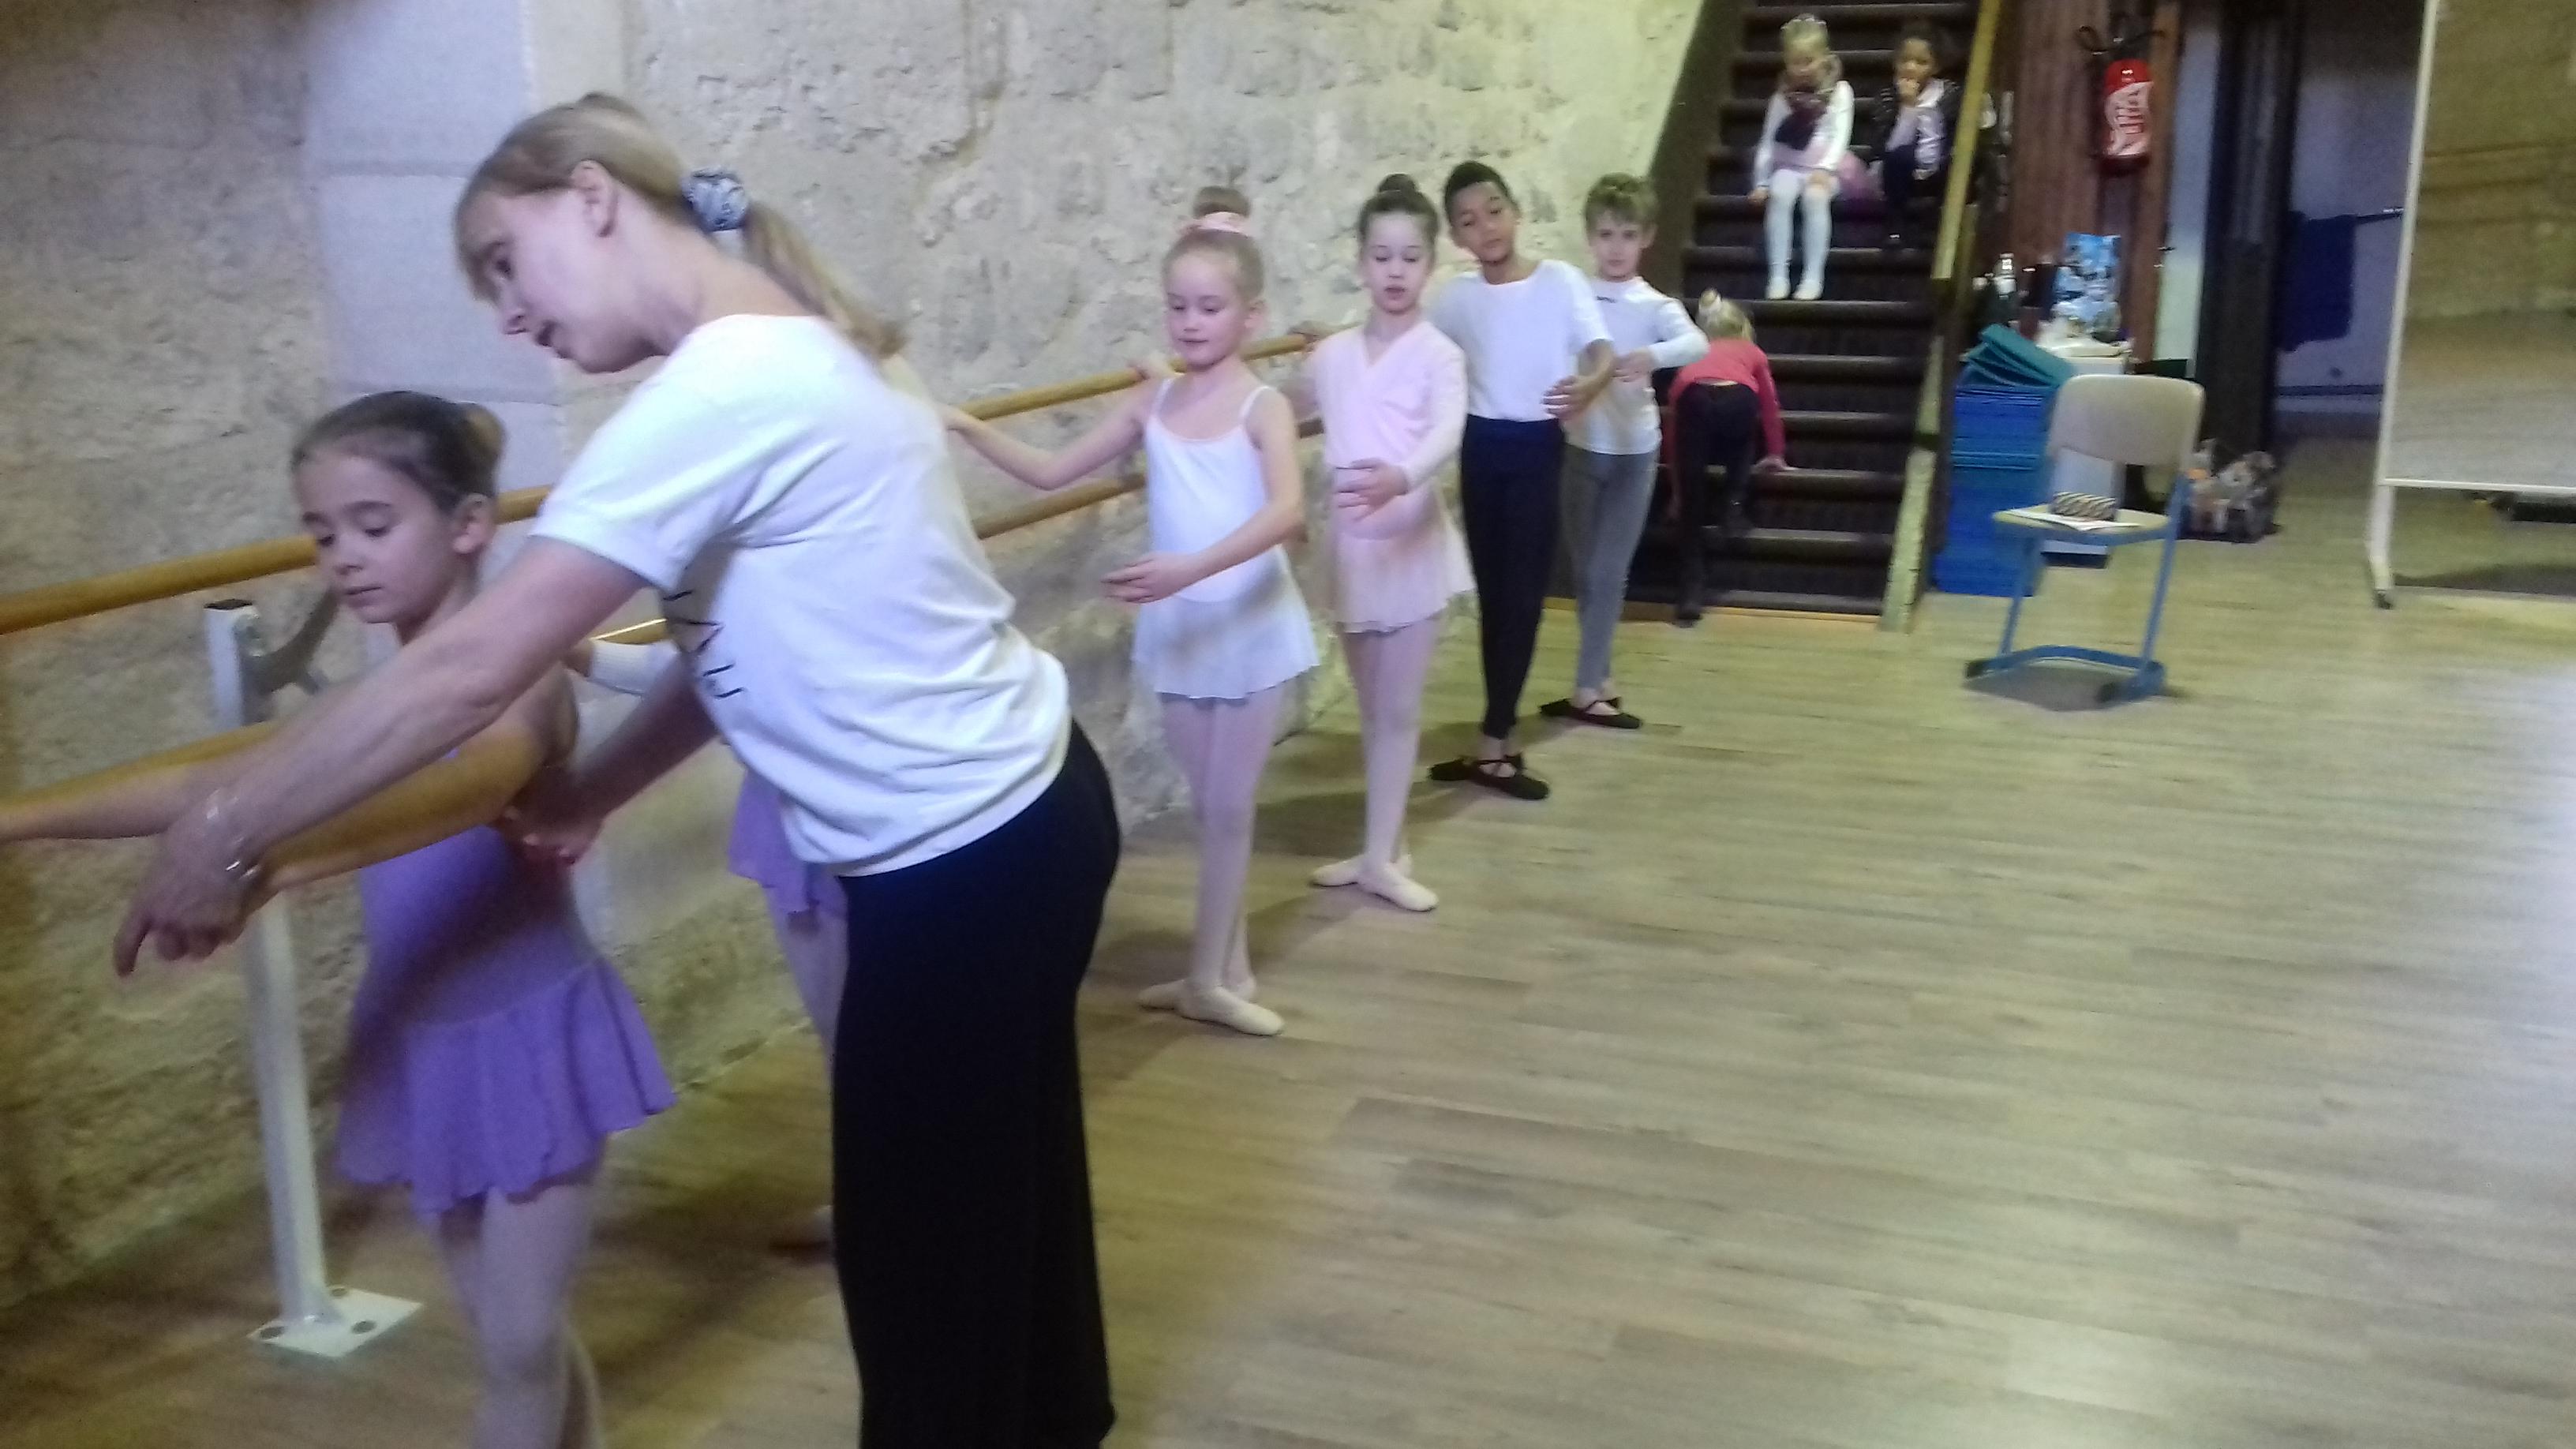 Protection du Genou pour la Danse Yoga Anti-Glisse Protection Respirante 2pcs genouill/ère Classicoco Genouill/ère Yoga Danse /épaissie Sport Ballet